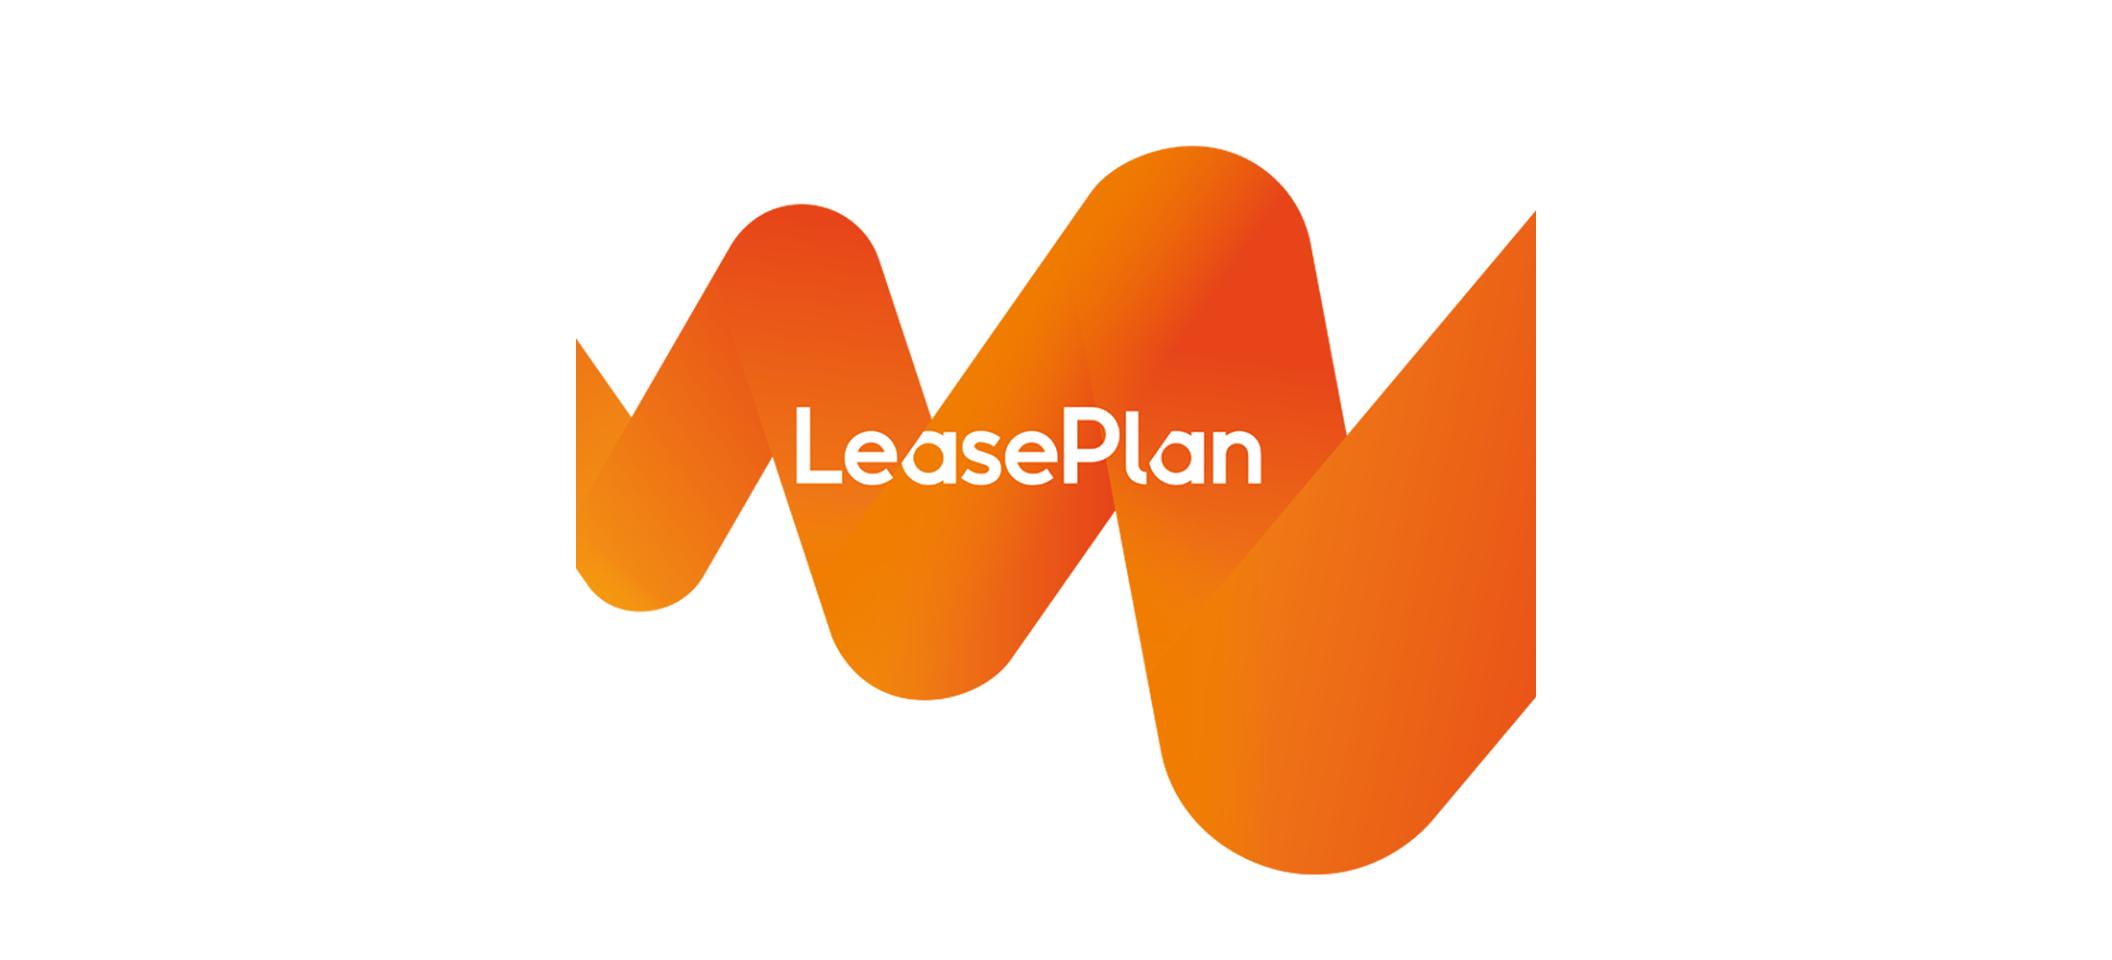 Leaseplan Not Selling Australia Nz Business Global Fleet